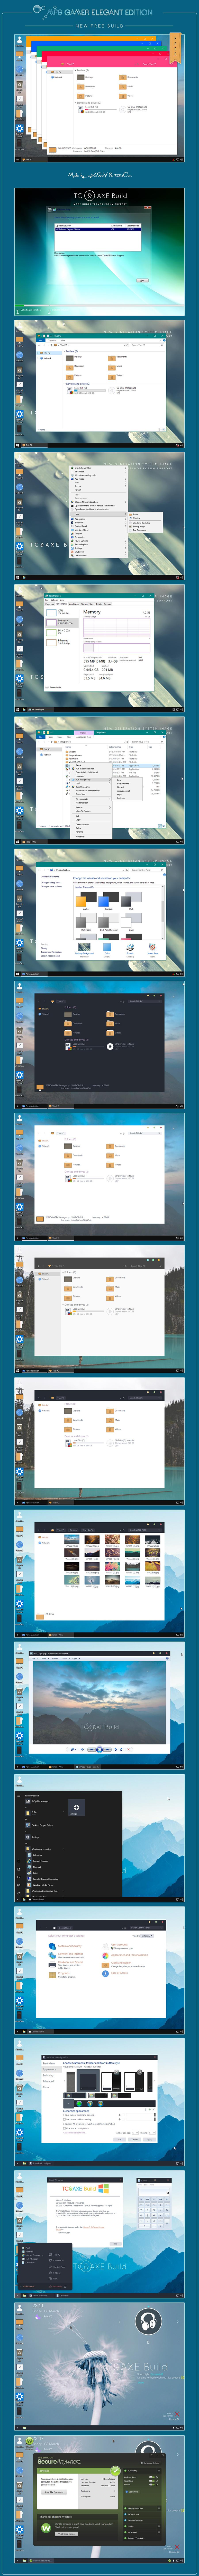 Torrent + Direct - MPB Gamer Elegant Edition | Team OS : Your Only